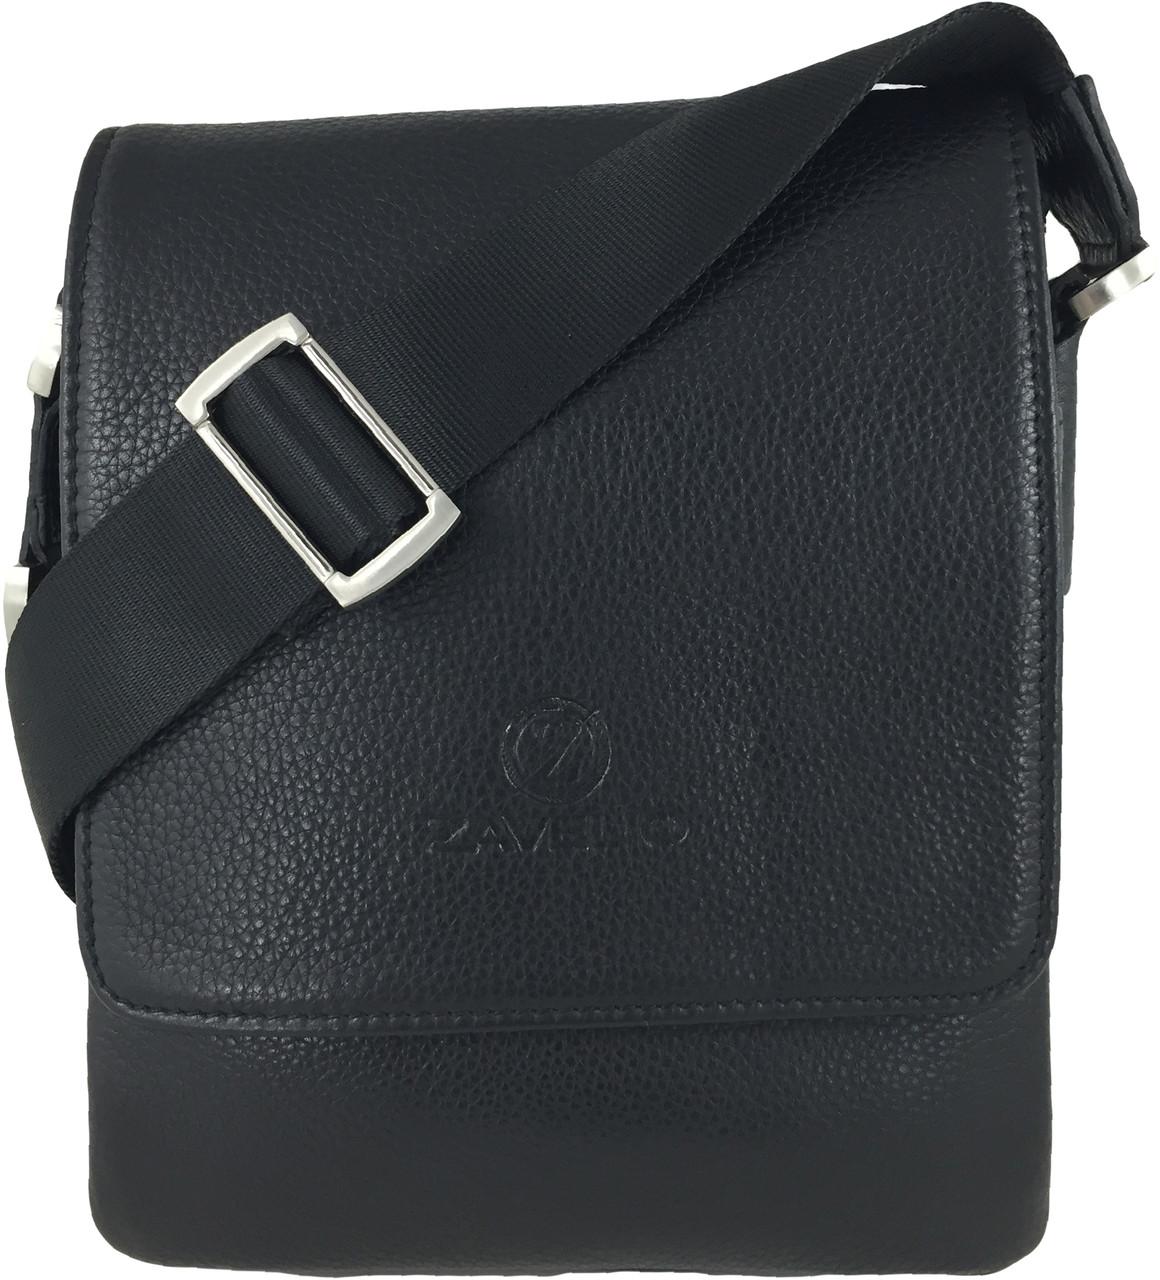 Men s Genuine Leather Small Crossbody Shoulder Messenger Bag - Black ... 2f65635c07e06